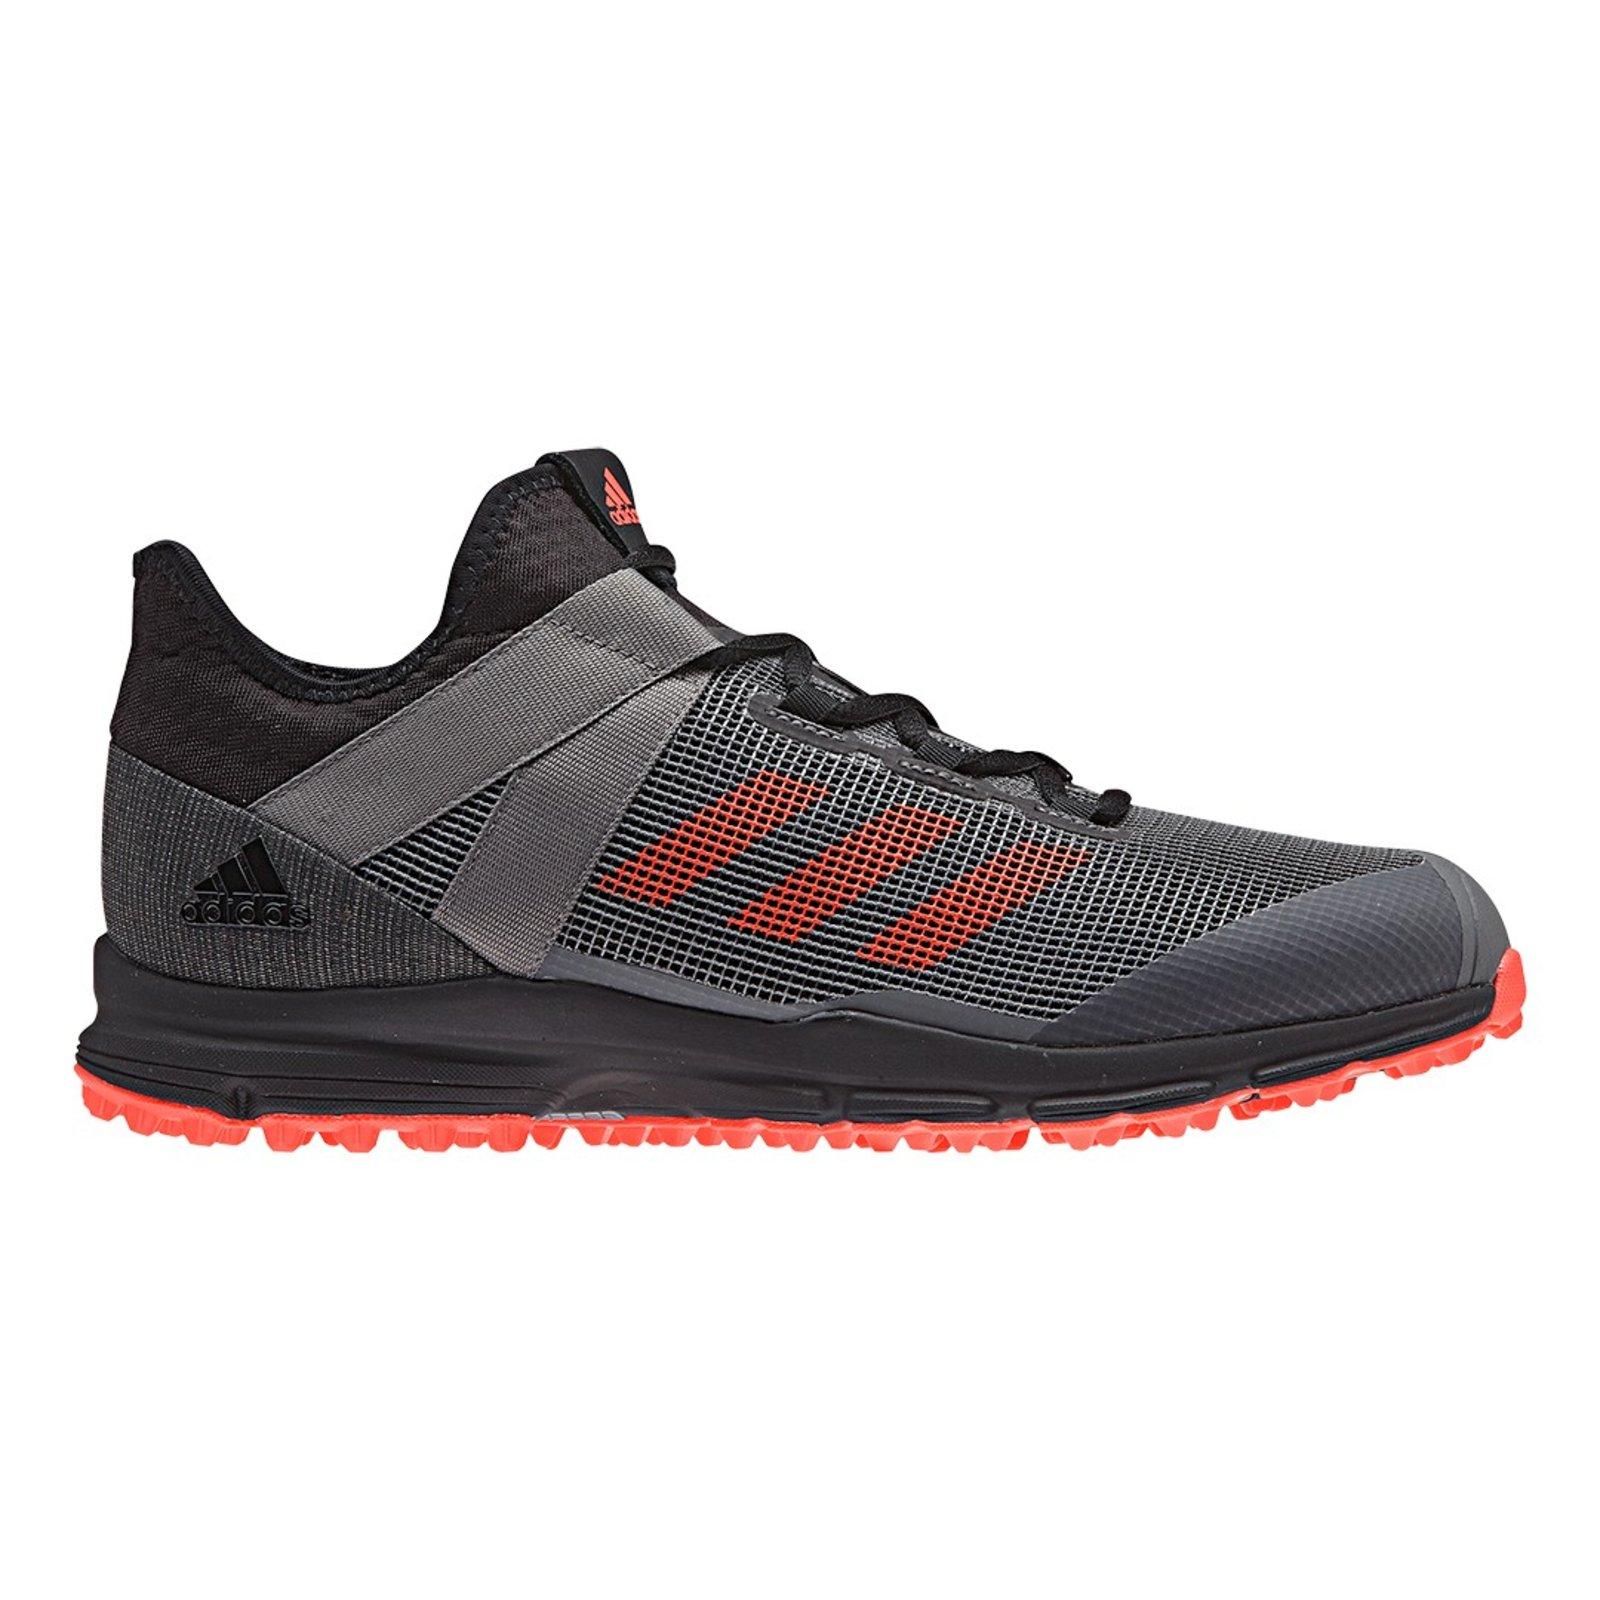 Adidas schuhe, schwarze schuhe, mens zone dox - sport - training